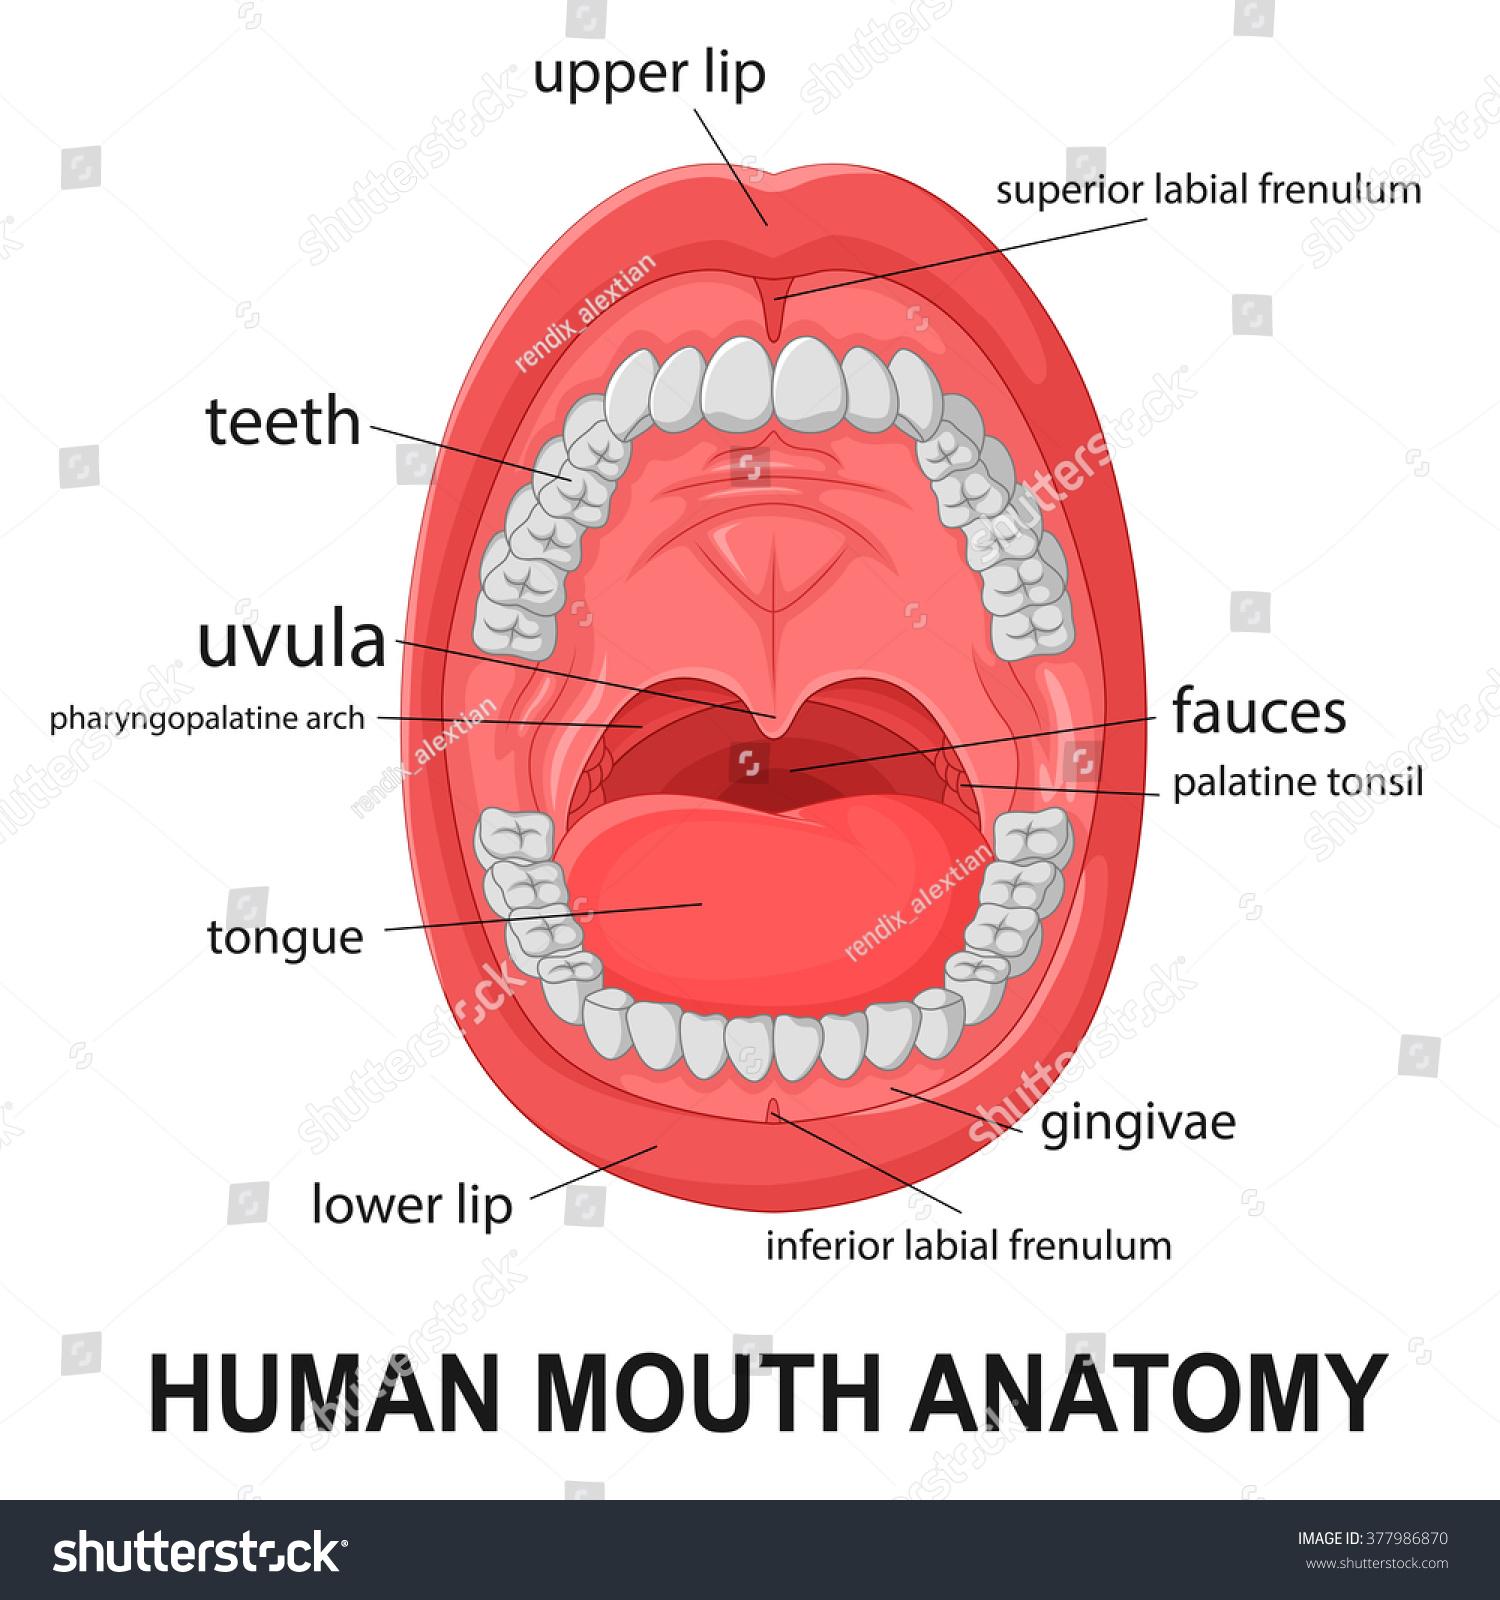 lip anatomy diagram hvac wiring diagrams human mouth open explaining stock